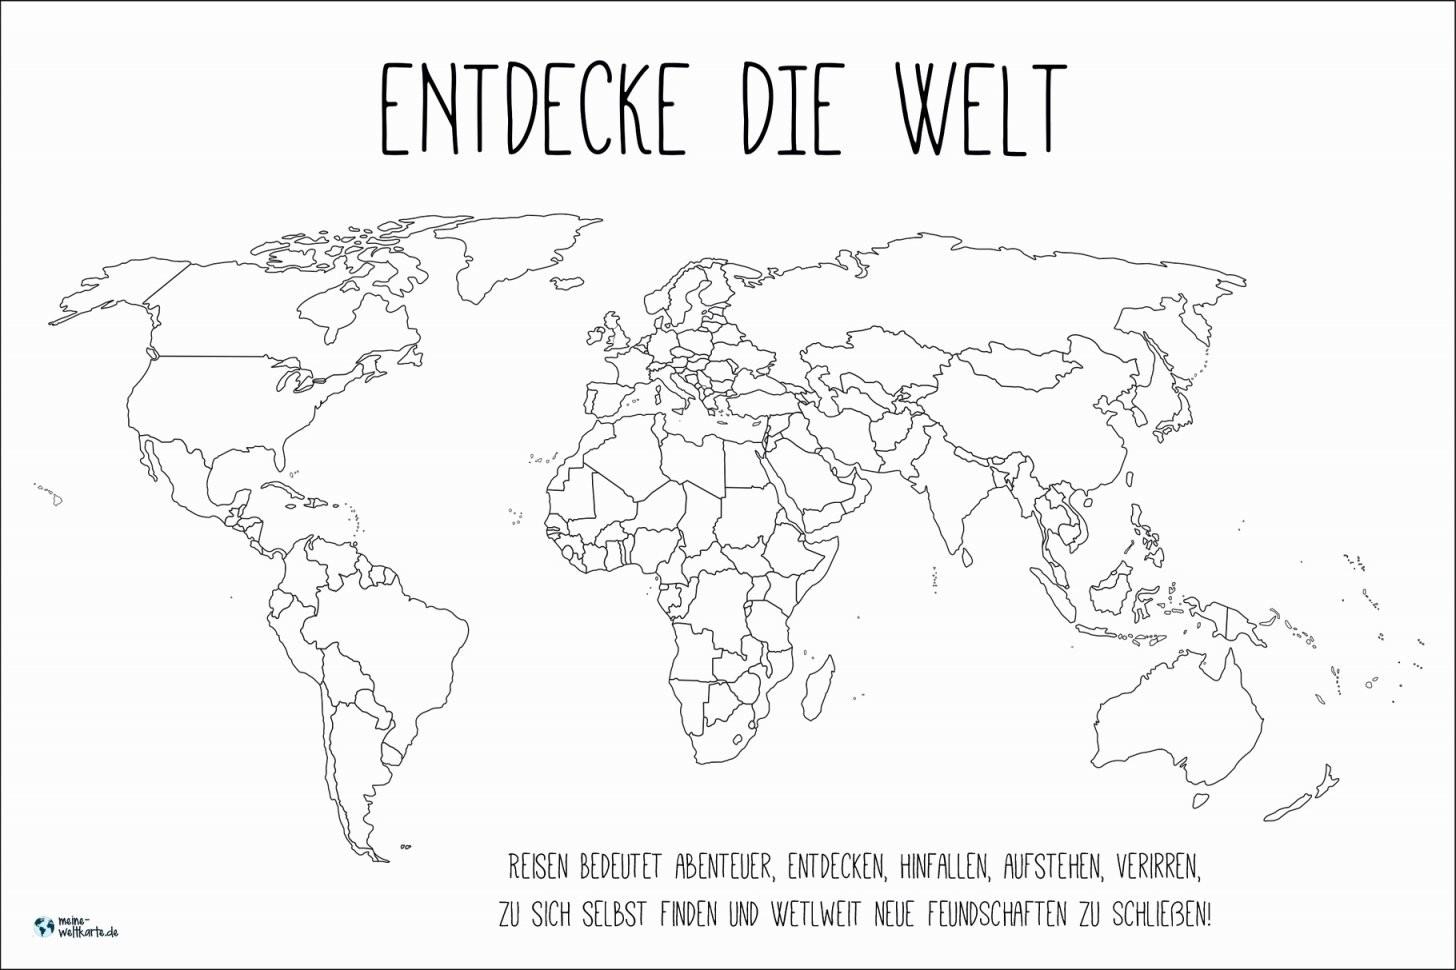 Weltkarte Pinnwand Selber Machen Produktfotos Billig Bestand Von von Weltkarte Pinnwand Selber Machen Photo